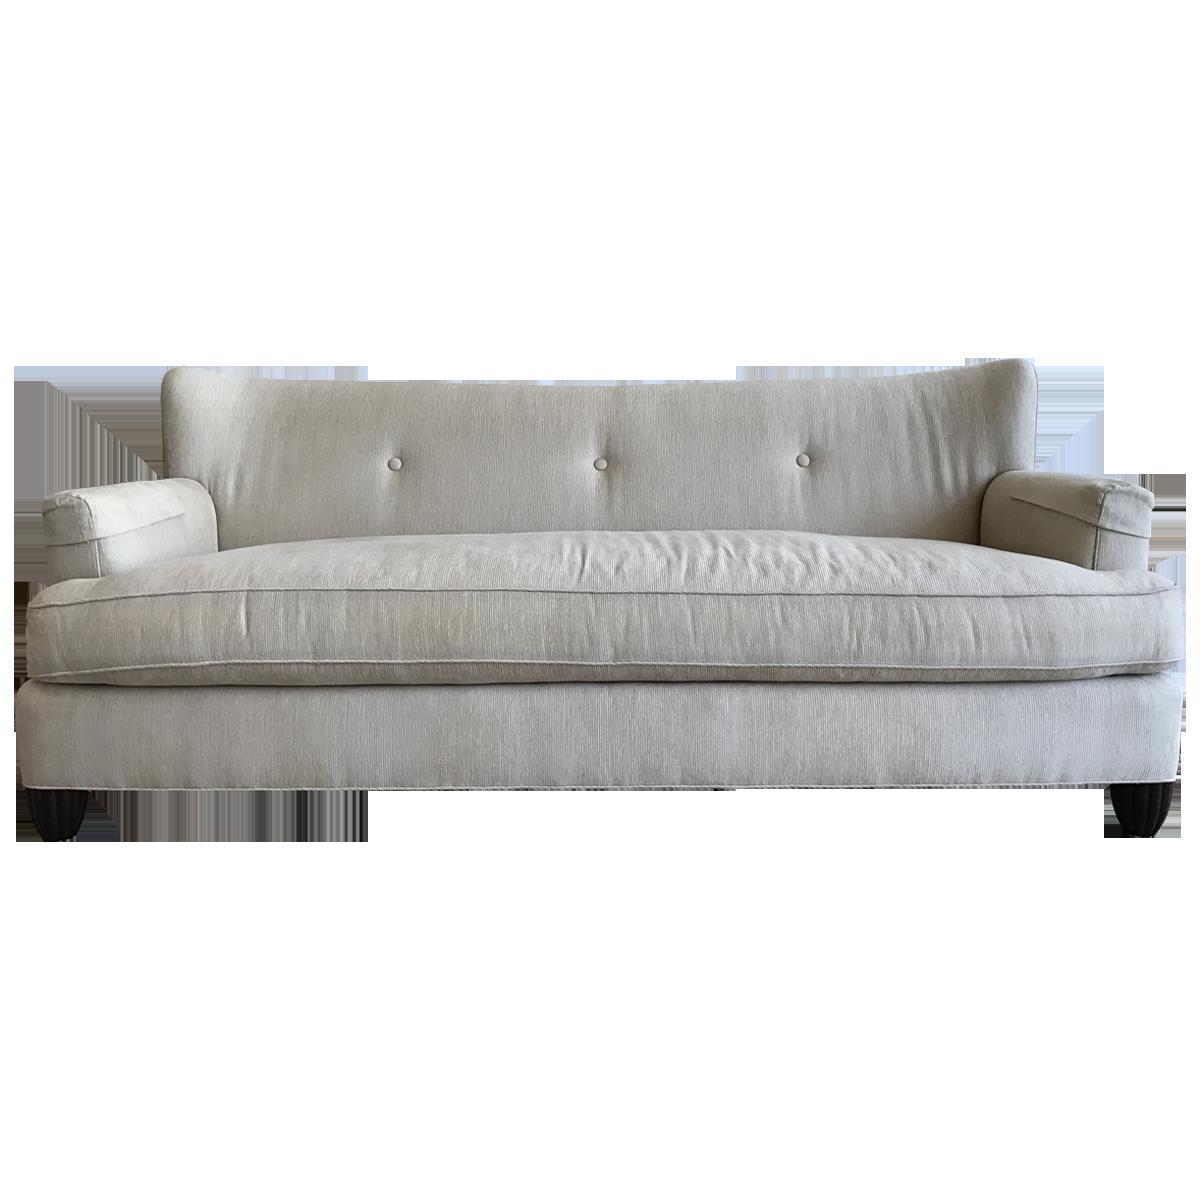 viyet-sale-baker-sofa